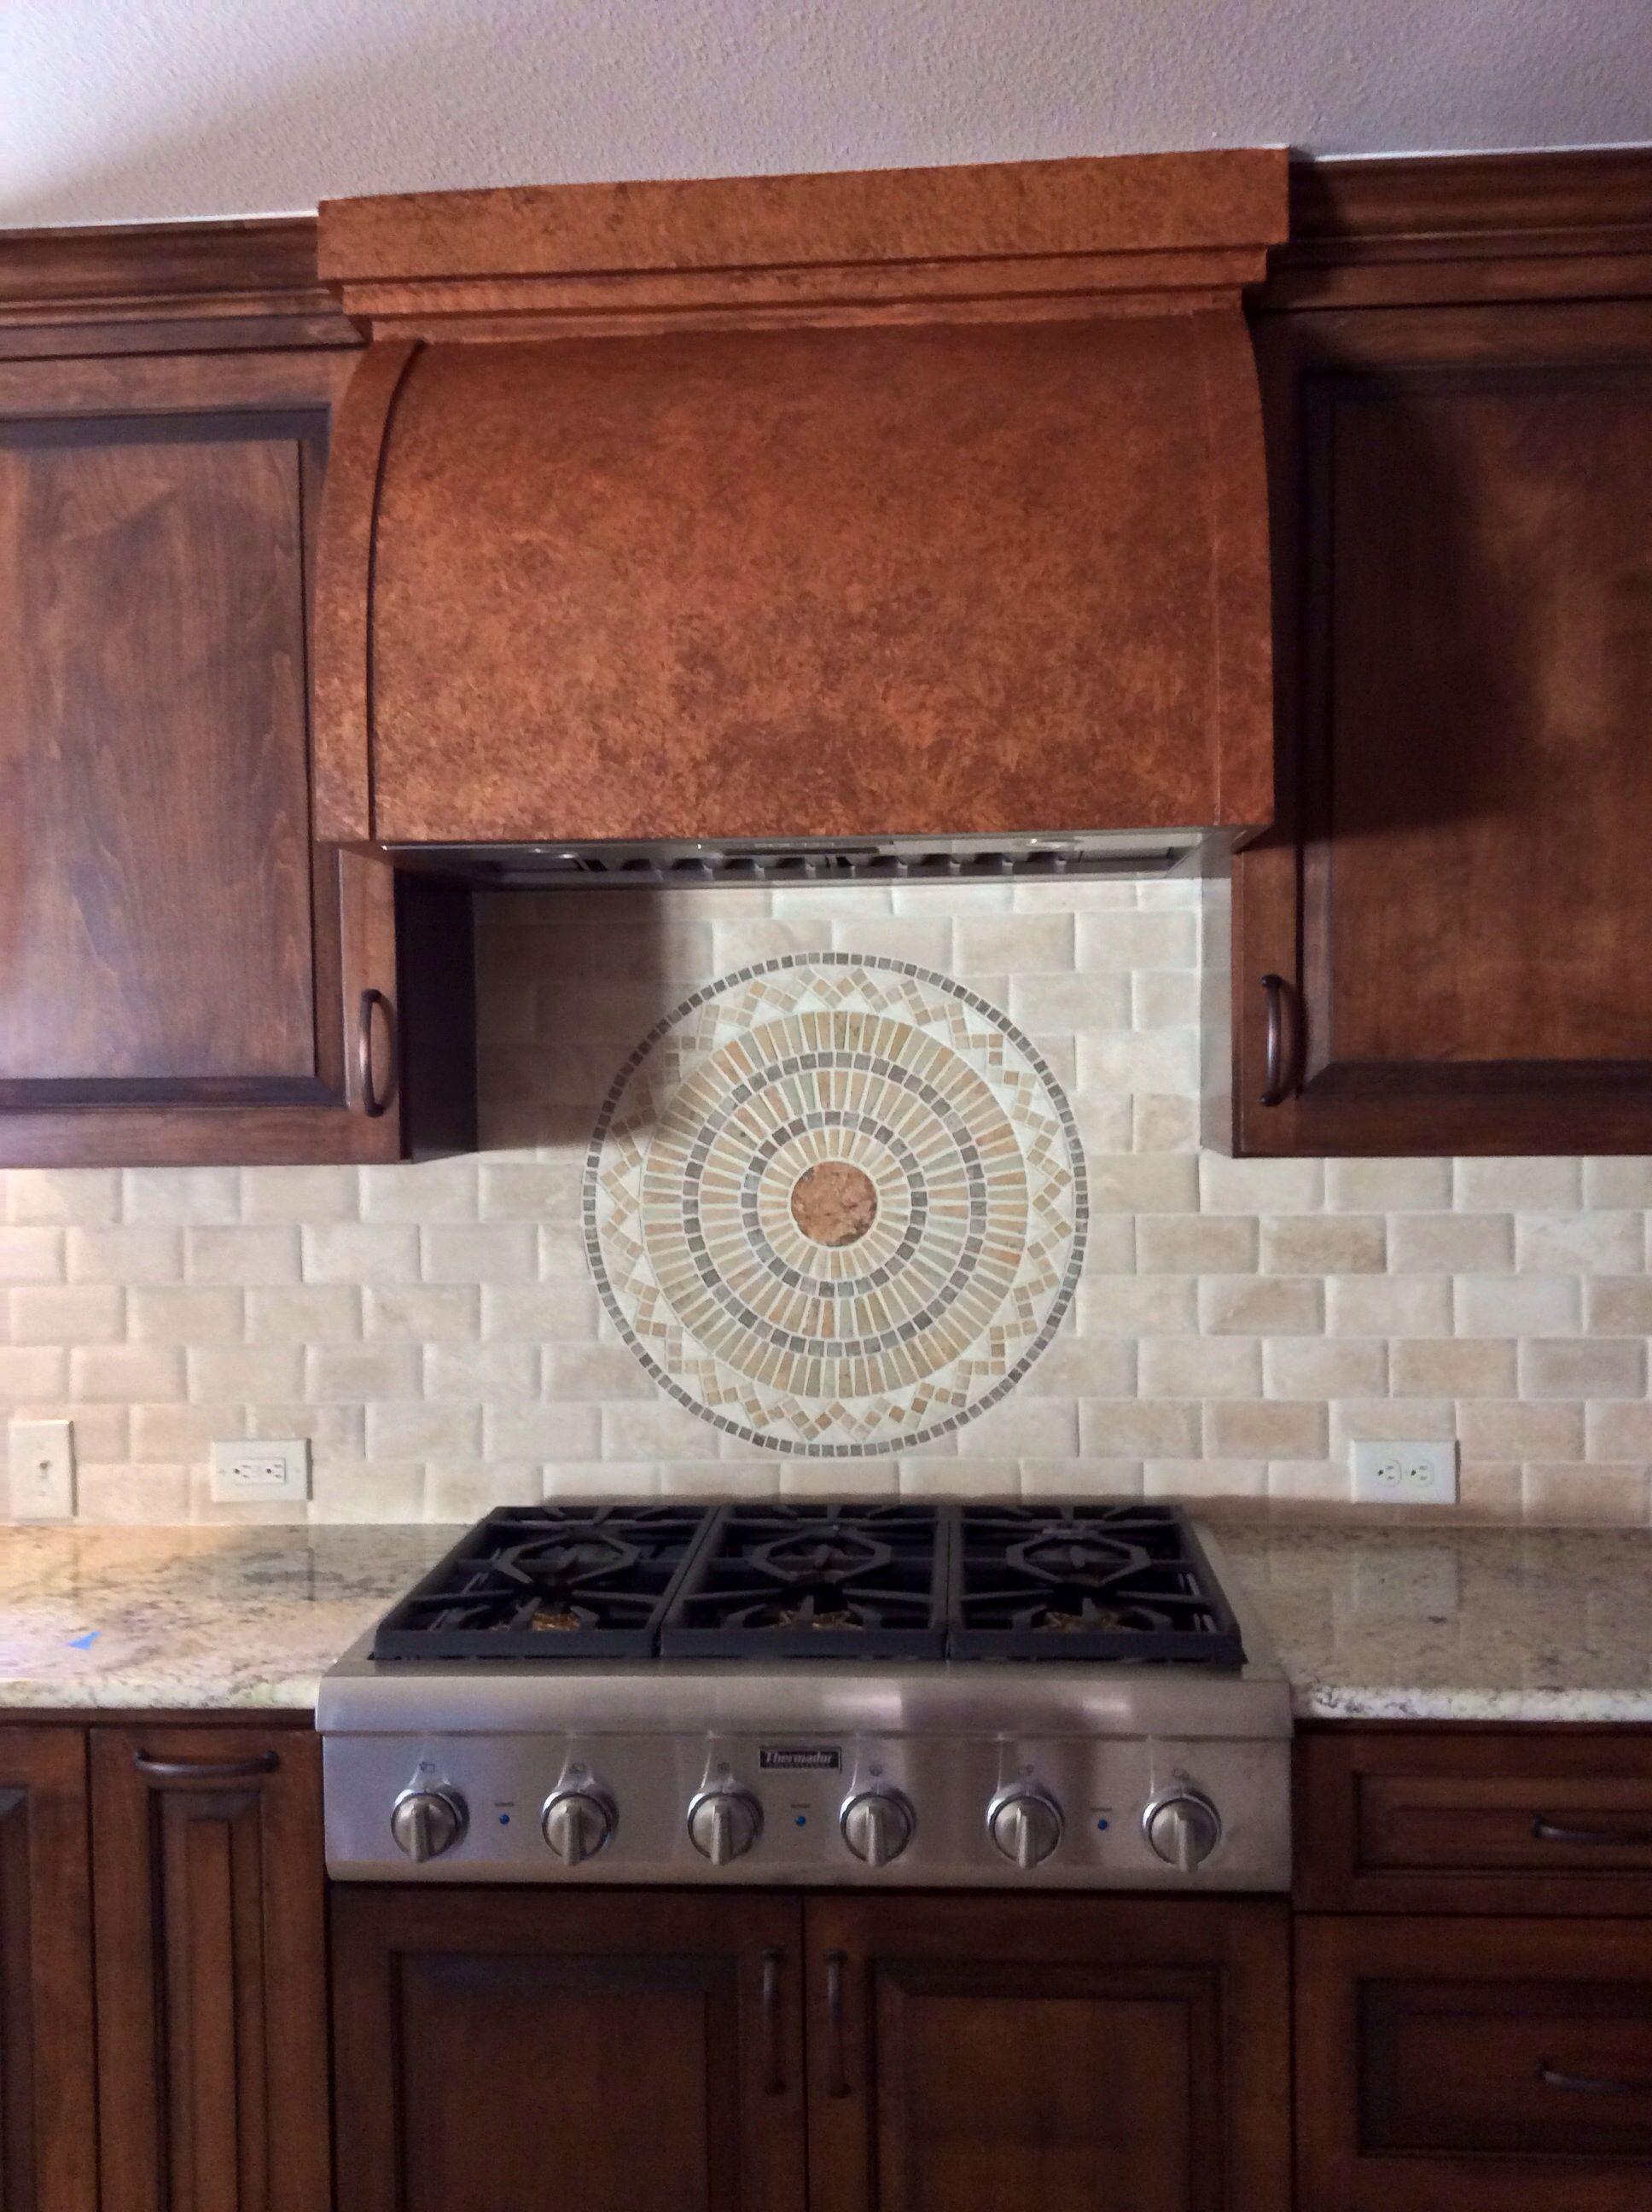 Kitchen Backsplash Centerpiece use a medallion as a centerpiece behind stove | backsplash